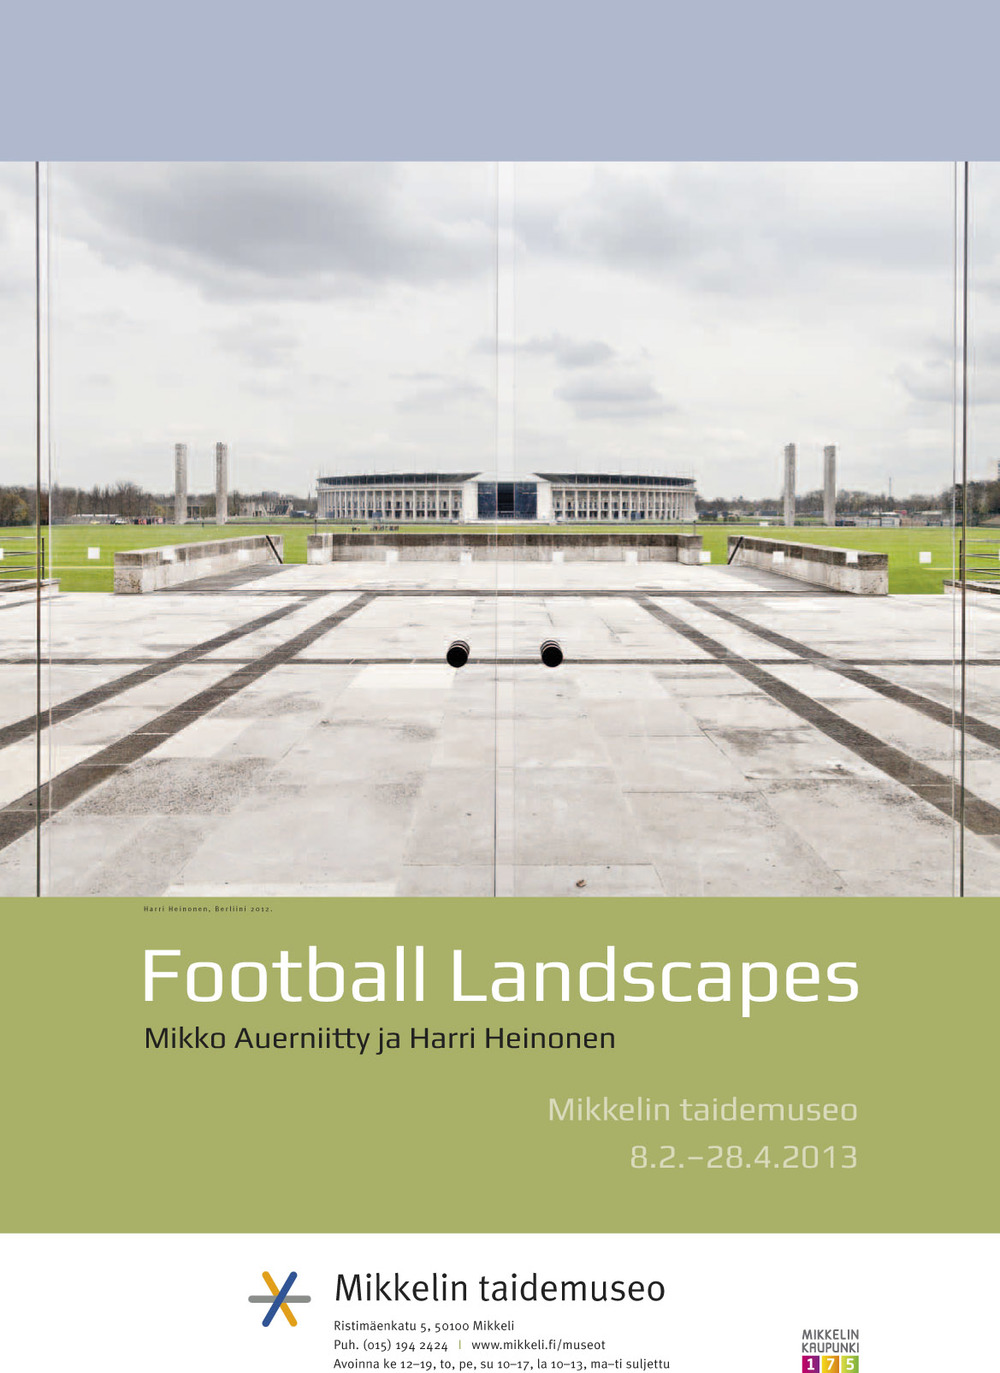 mikko__auerniitty_harri_heinonen_football_landscapes_dialab_nayttely.jpg